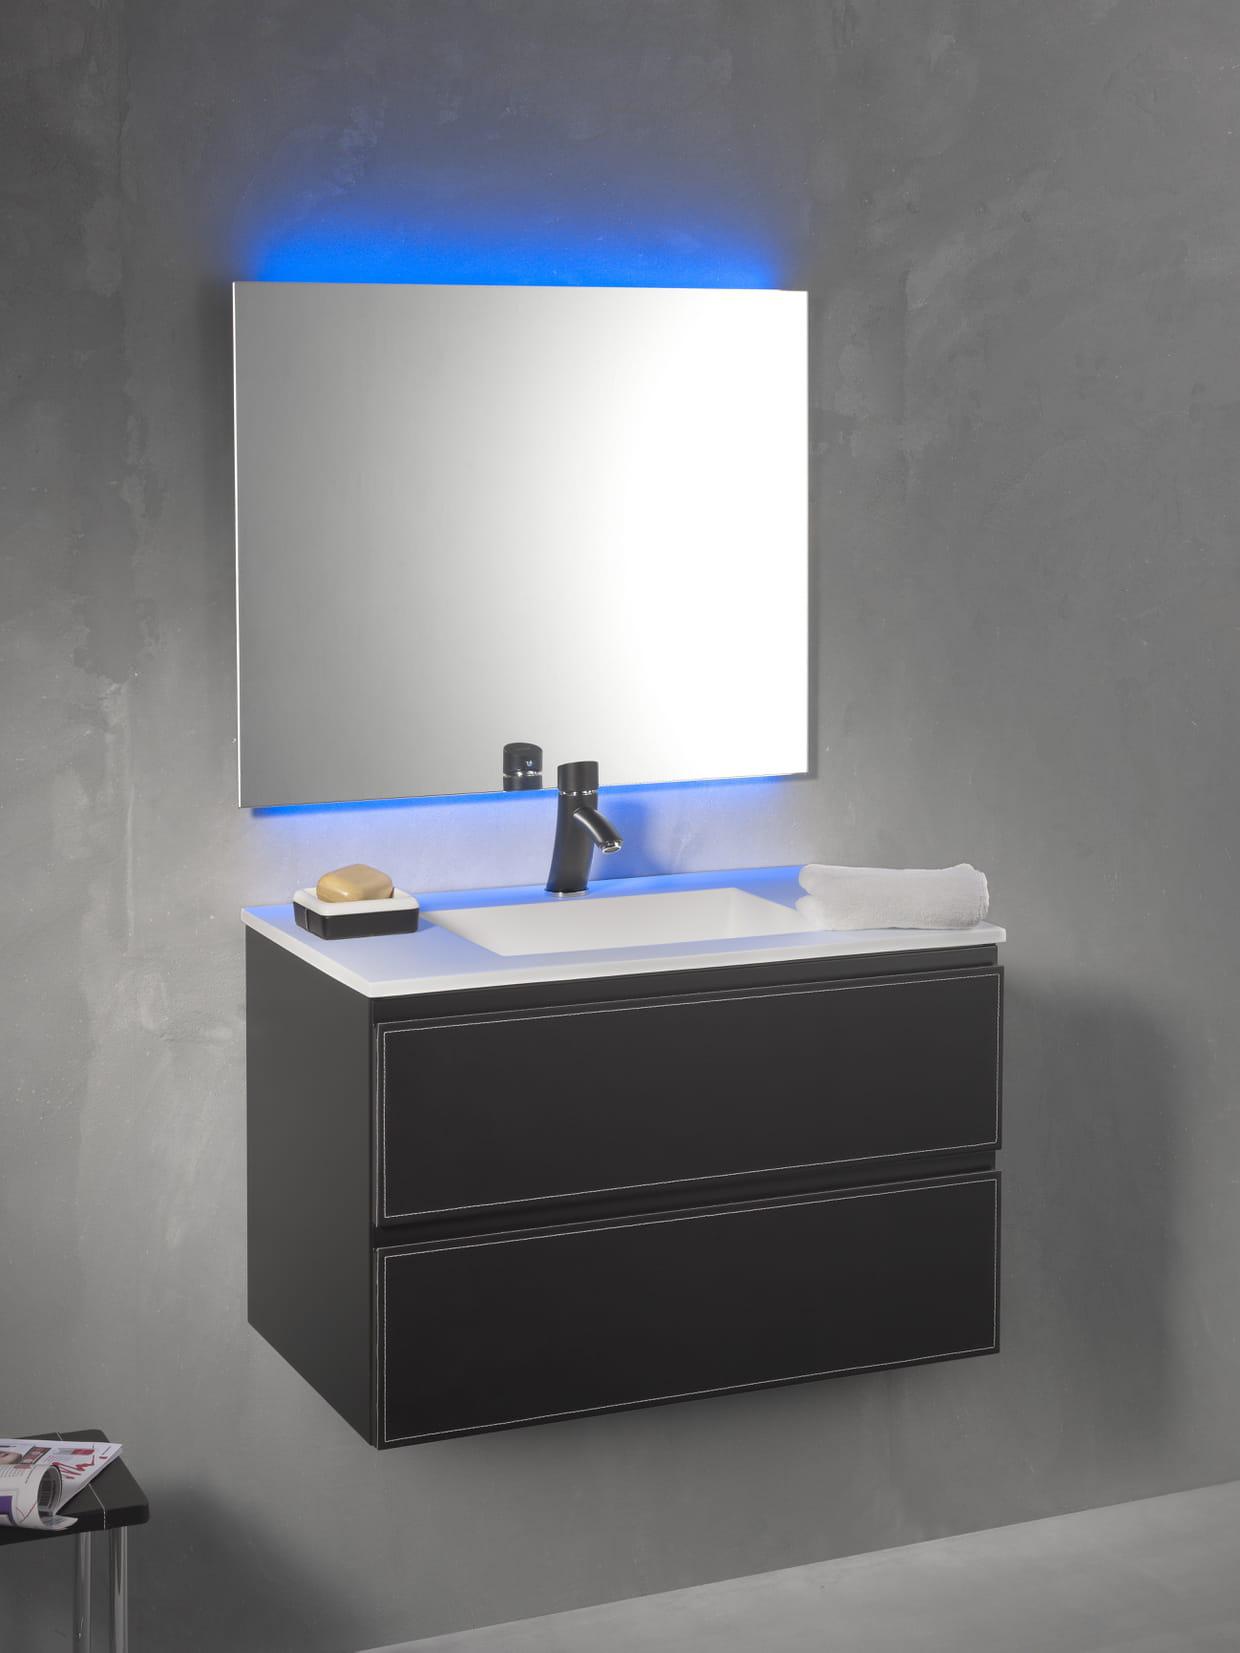 Meuble loft bath par kramer design for Meuble ytrac